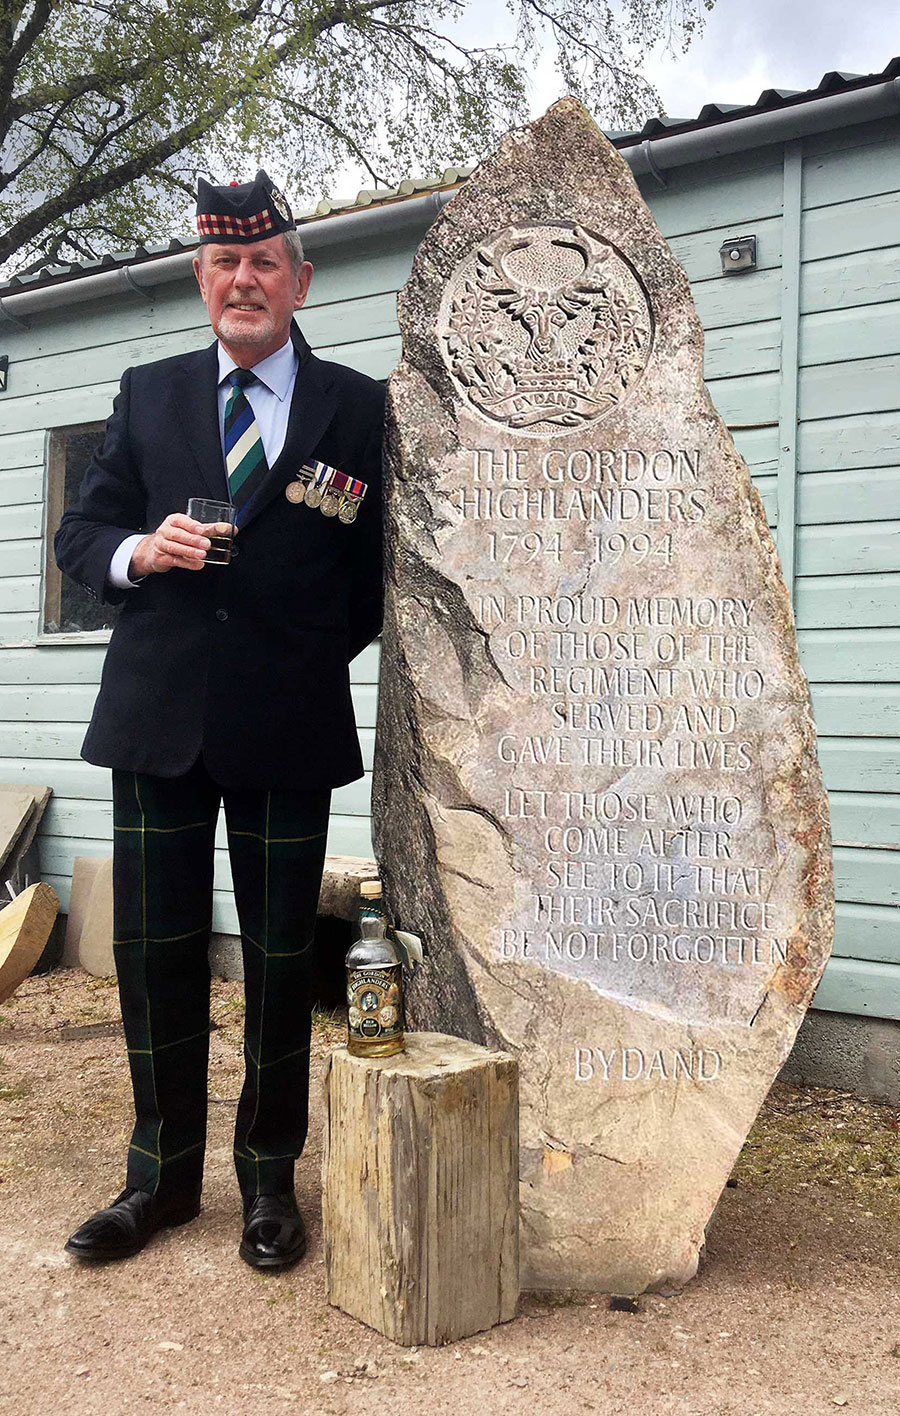 Gordon Highlanders Memorial VE Day 75